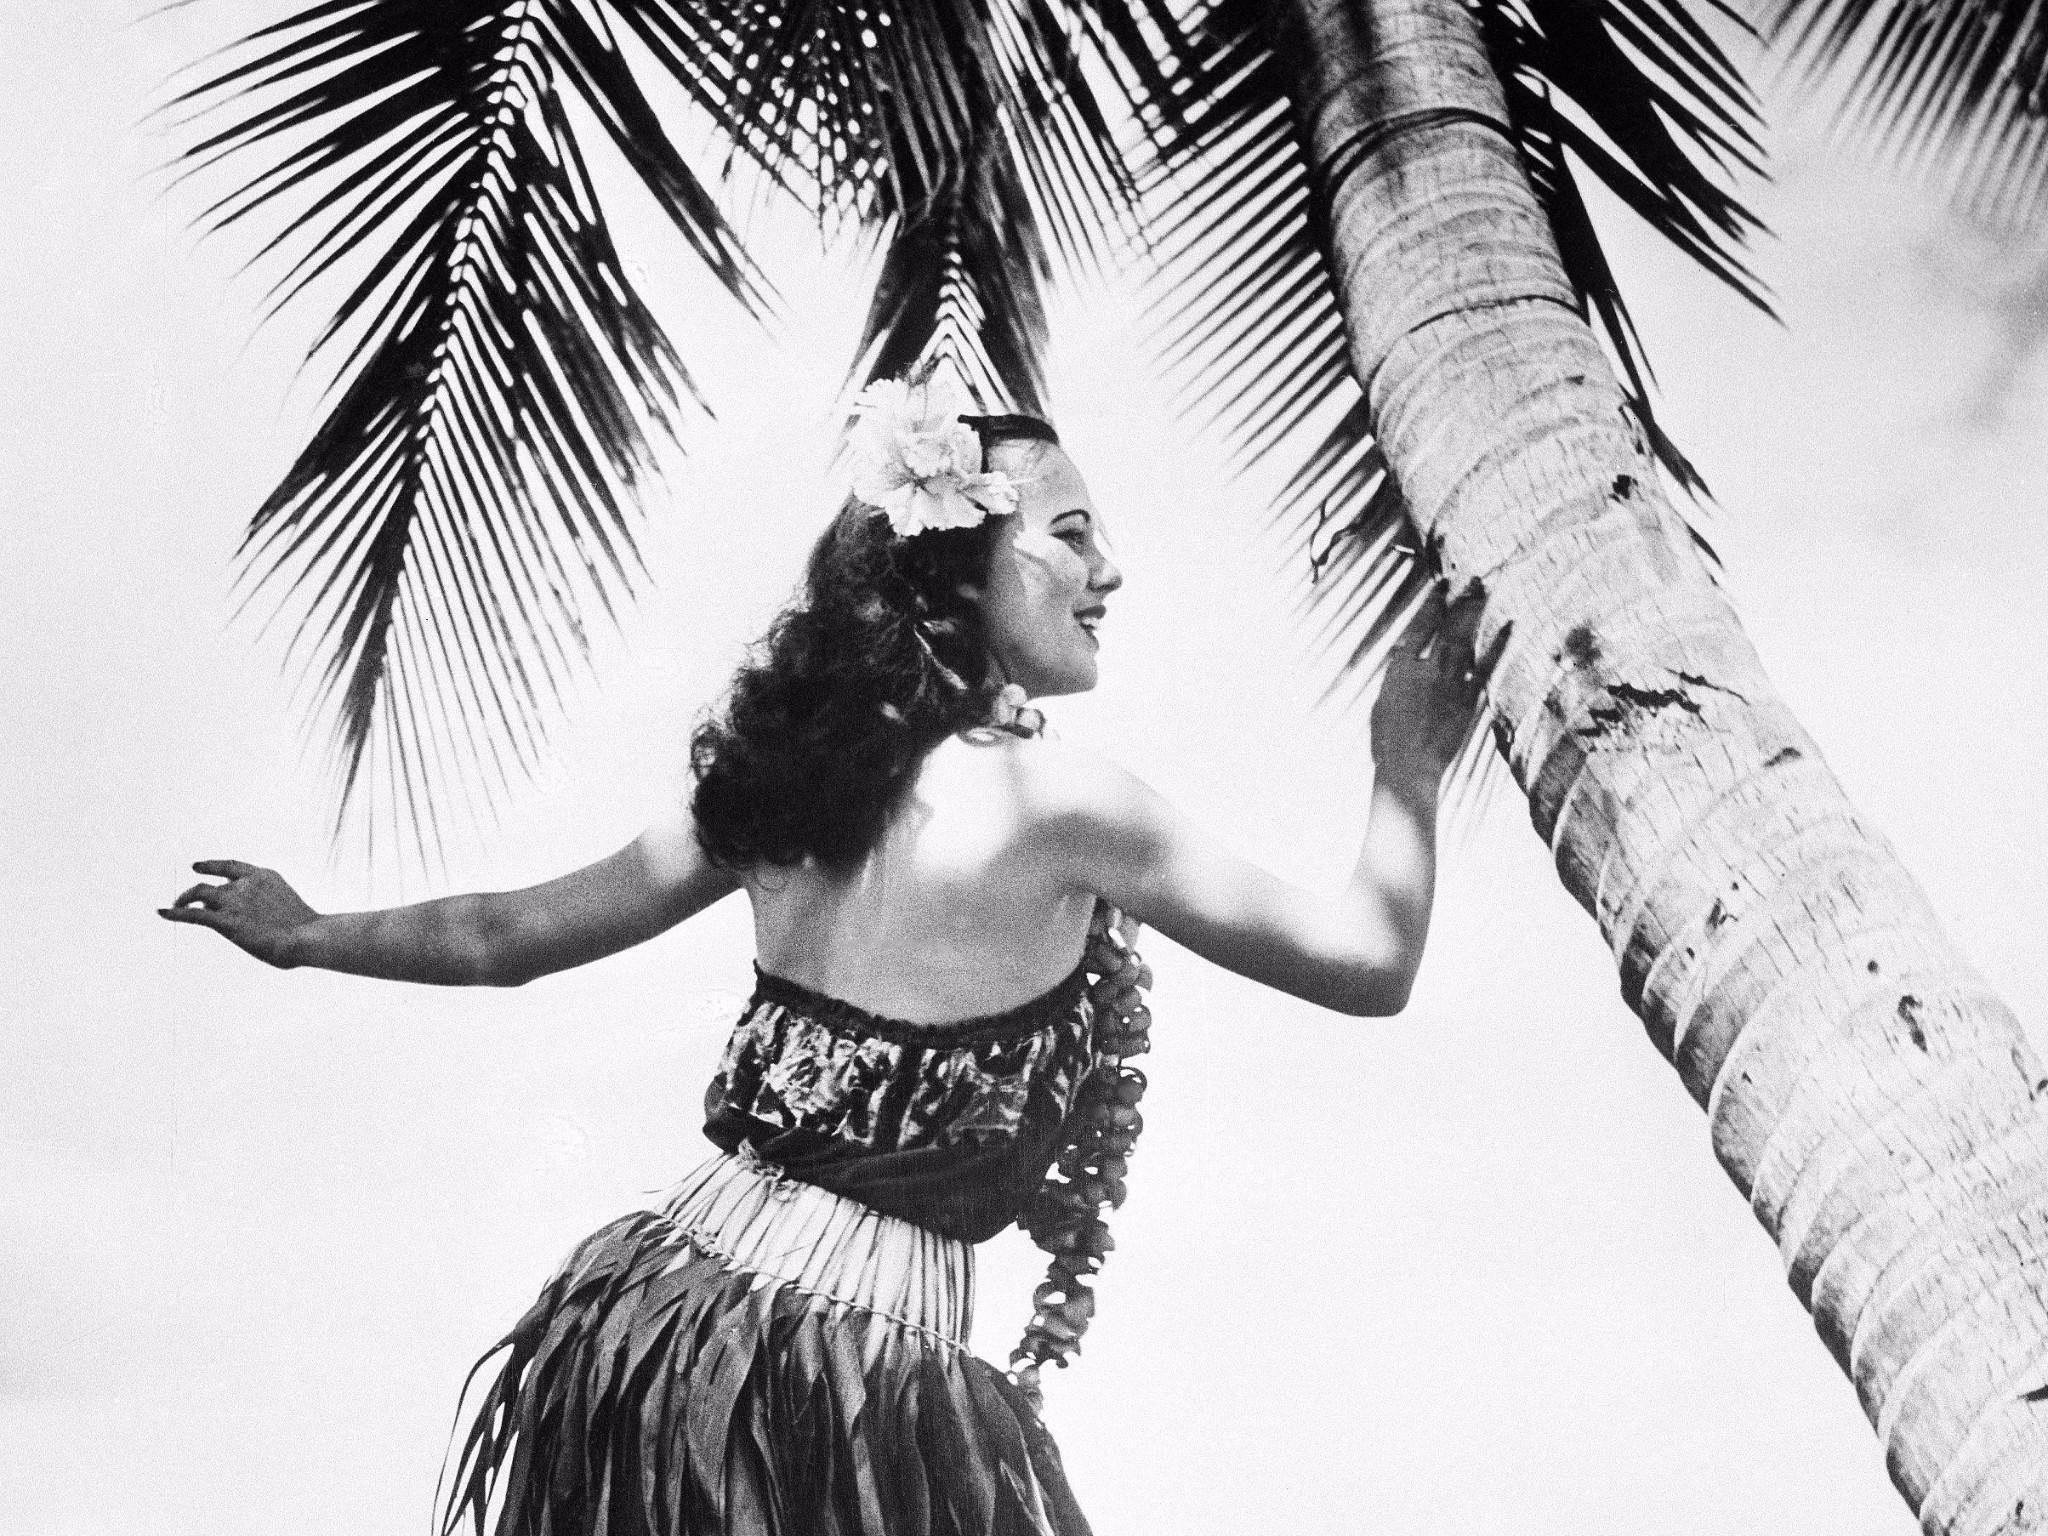 Live Hawaii Lifestyle - Magazine cover